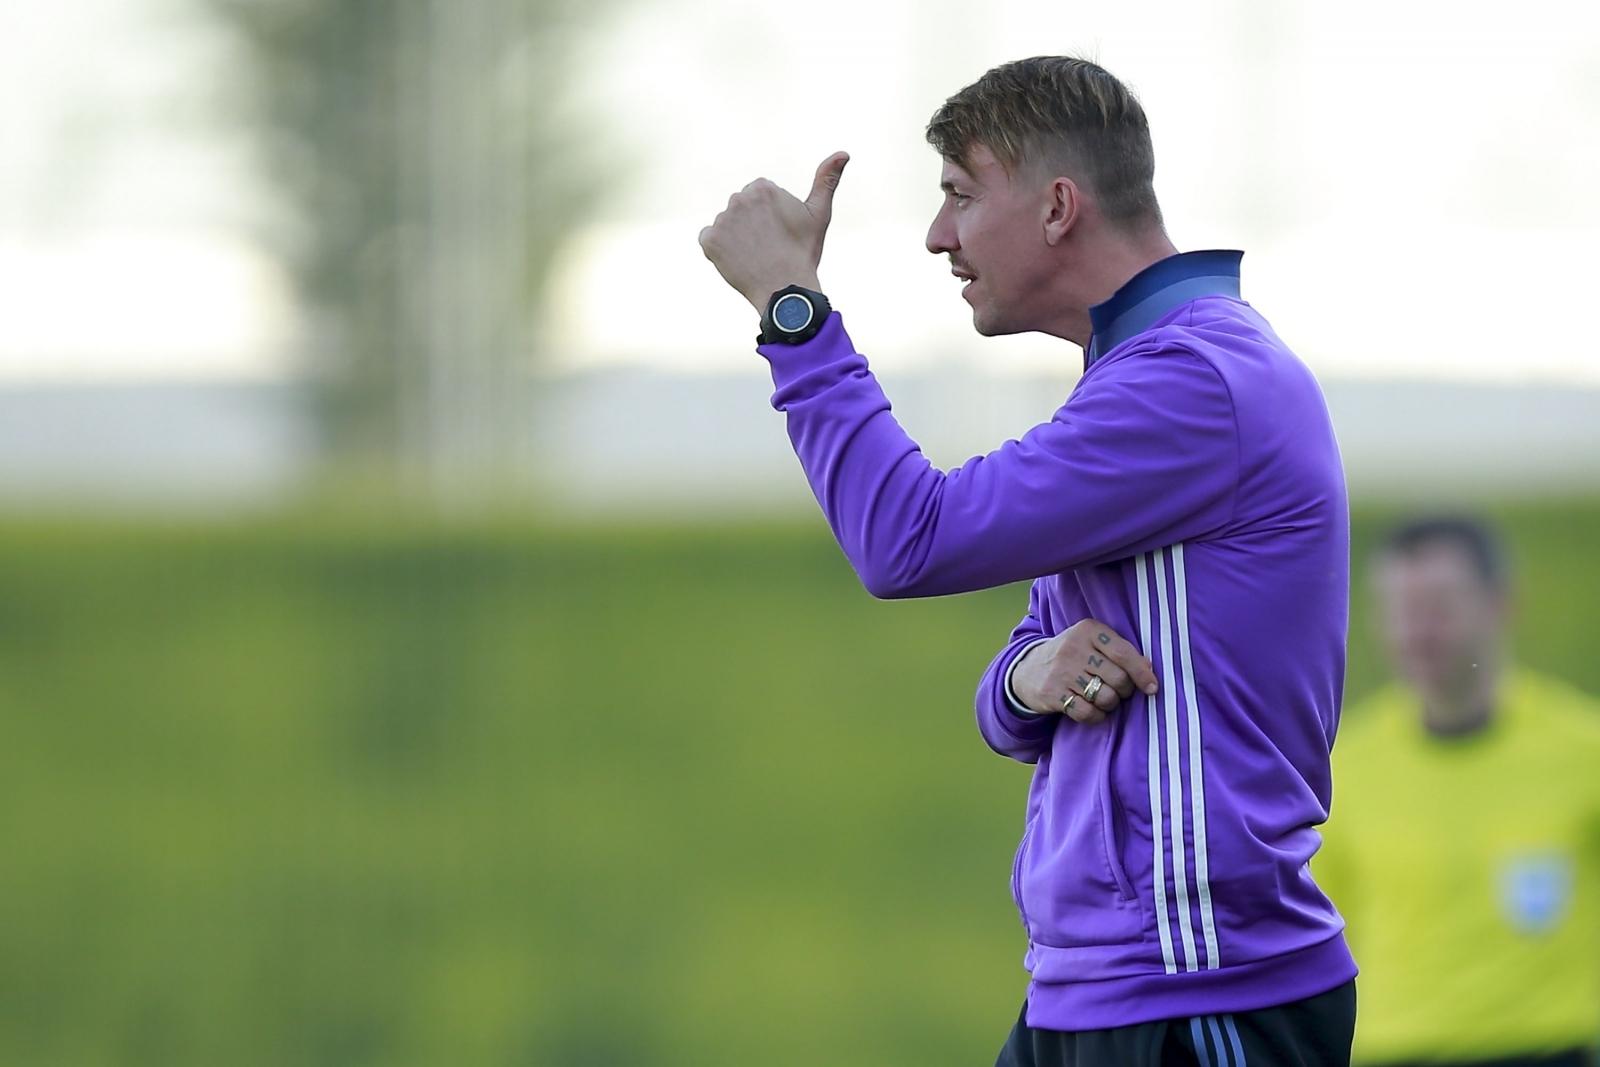 Van Dijk will only get better at Liverpool, says Karius